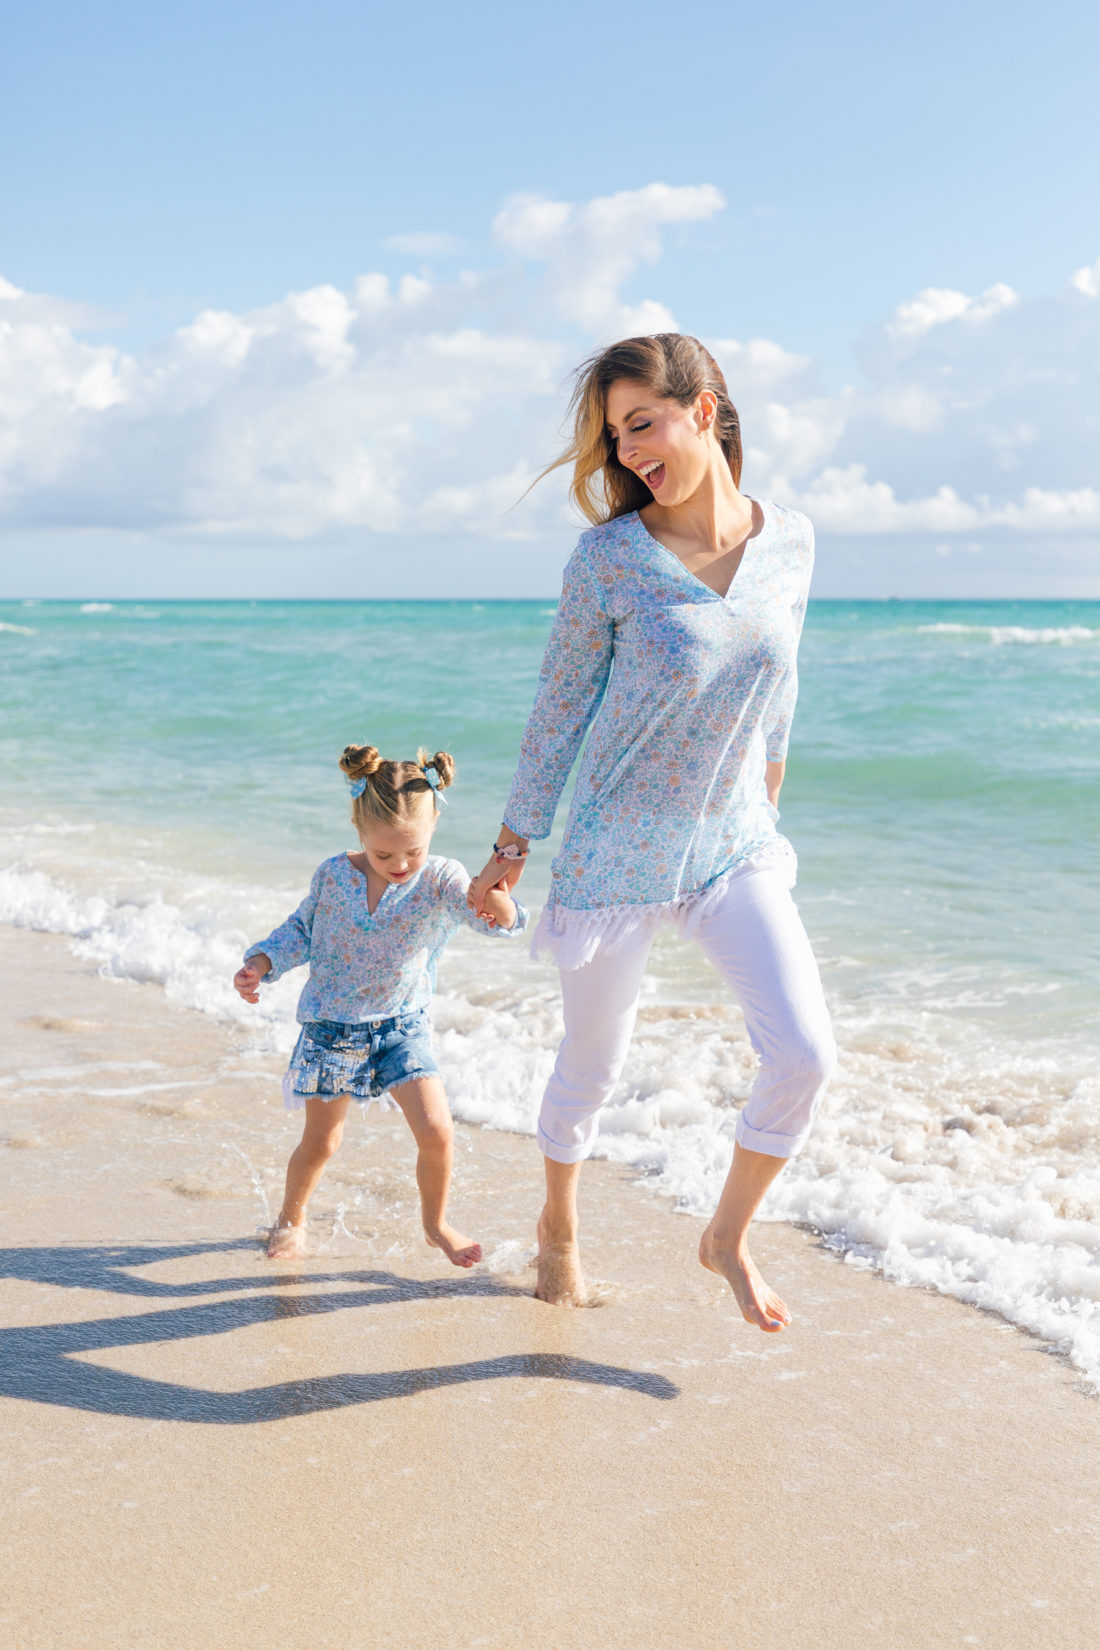 Eva Amurri Martino and Marlowe Martino wear matching Happily Eva After x Masala Baby tunics and run along the water's edge in Miami FL